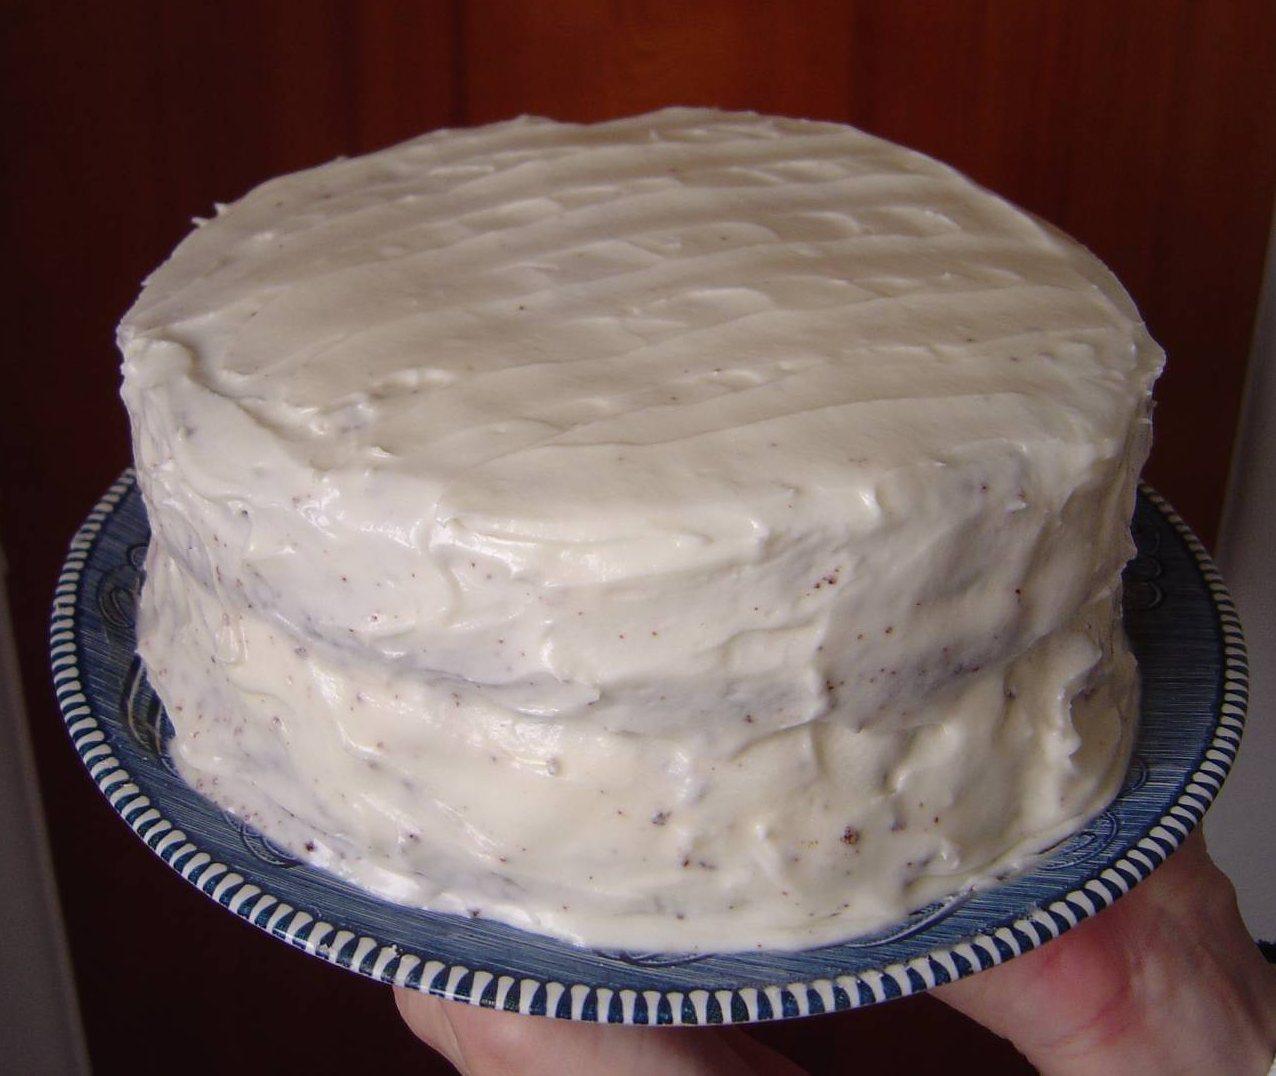 My Favorite Chocolate Cake With Hazelnut Cream Icing